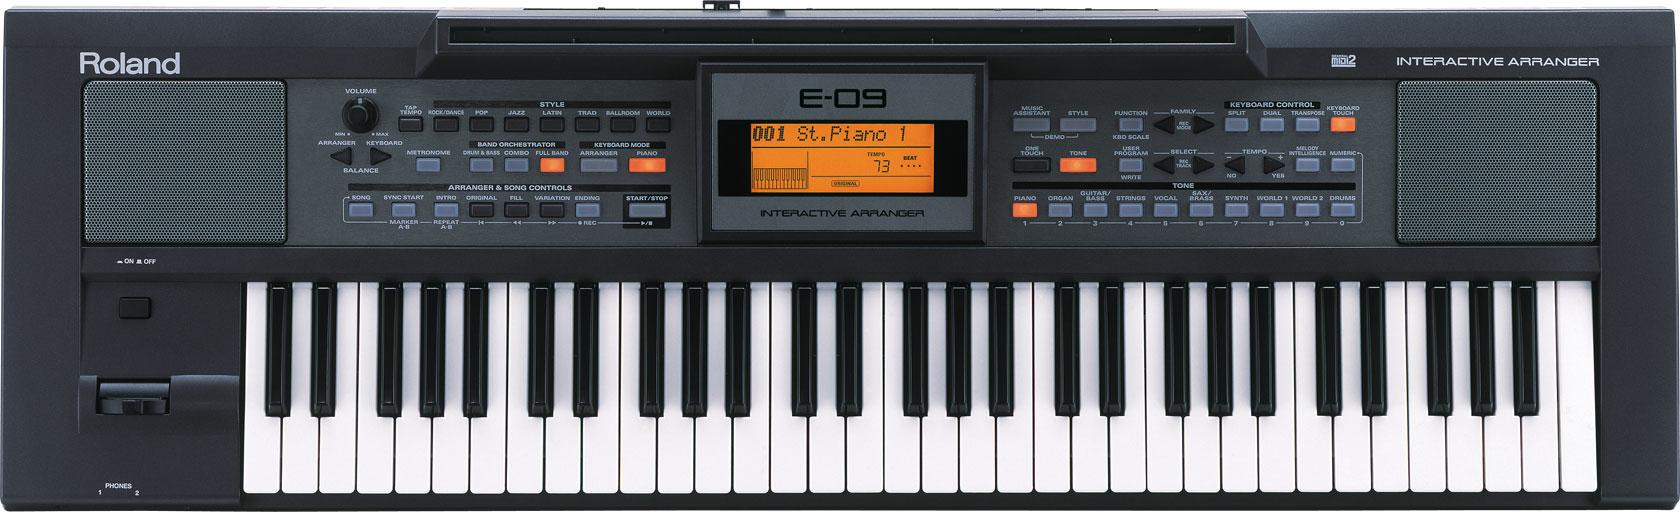 Image Result For Roland Arranger Keyboard Price In India